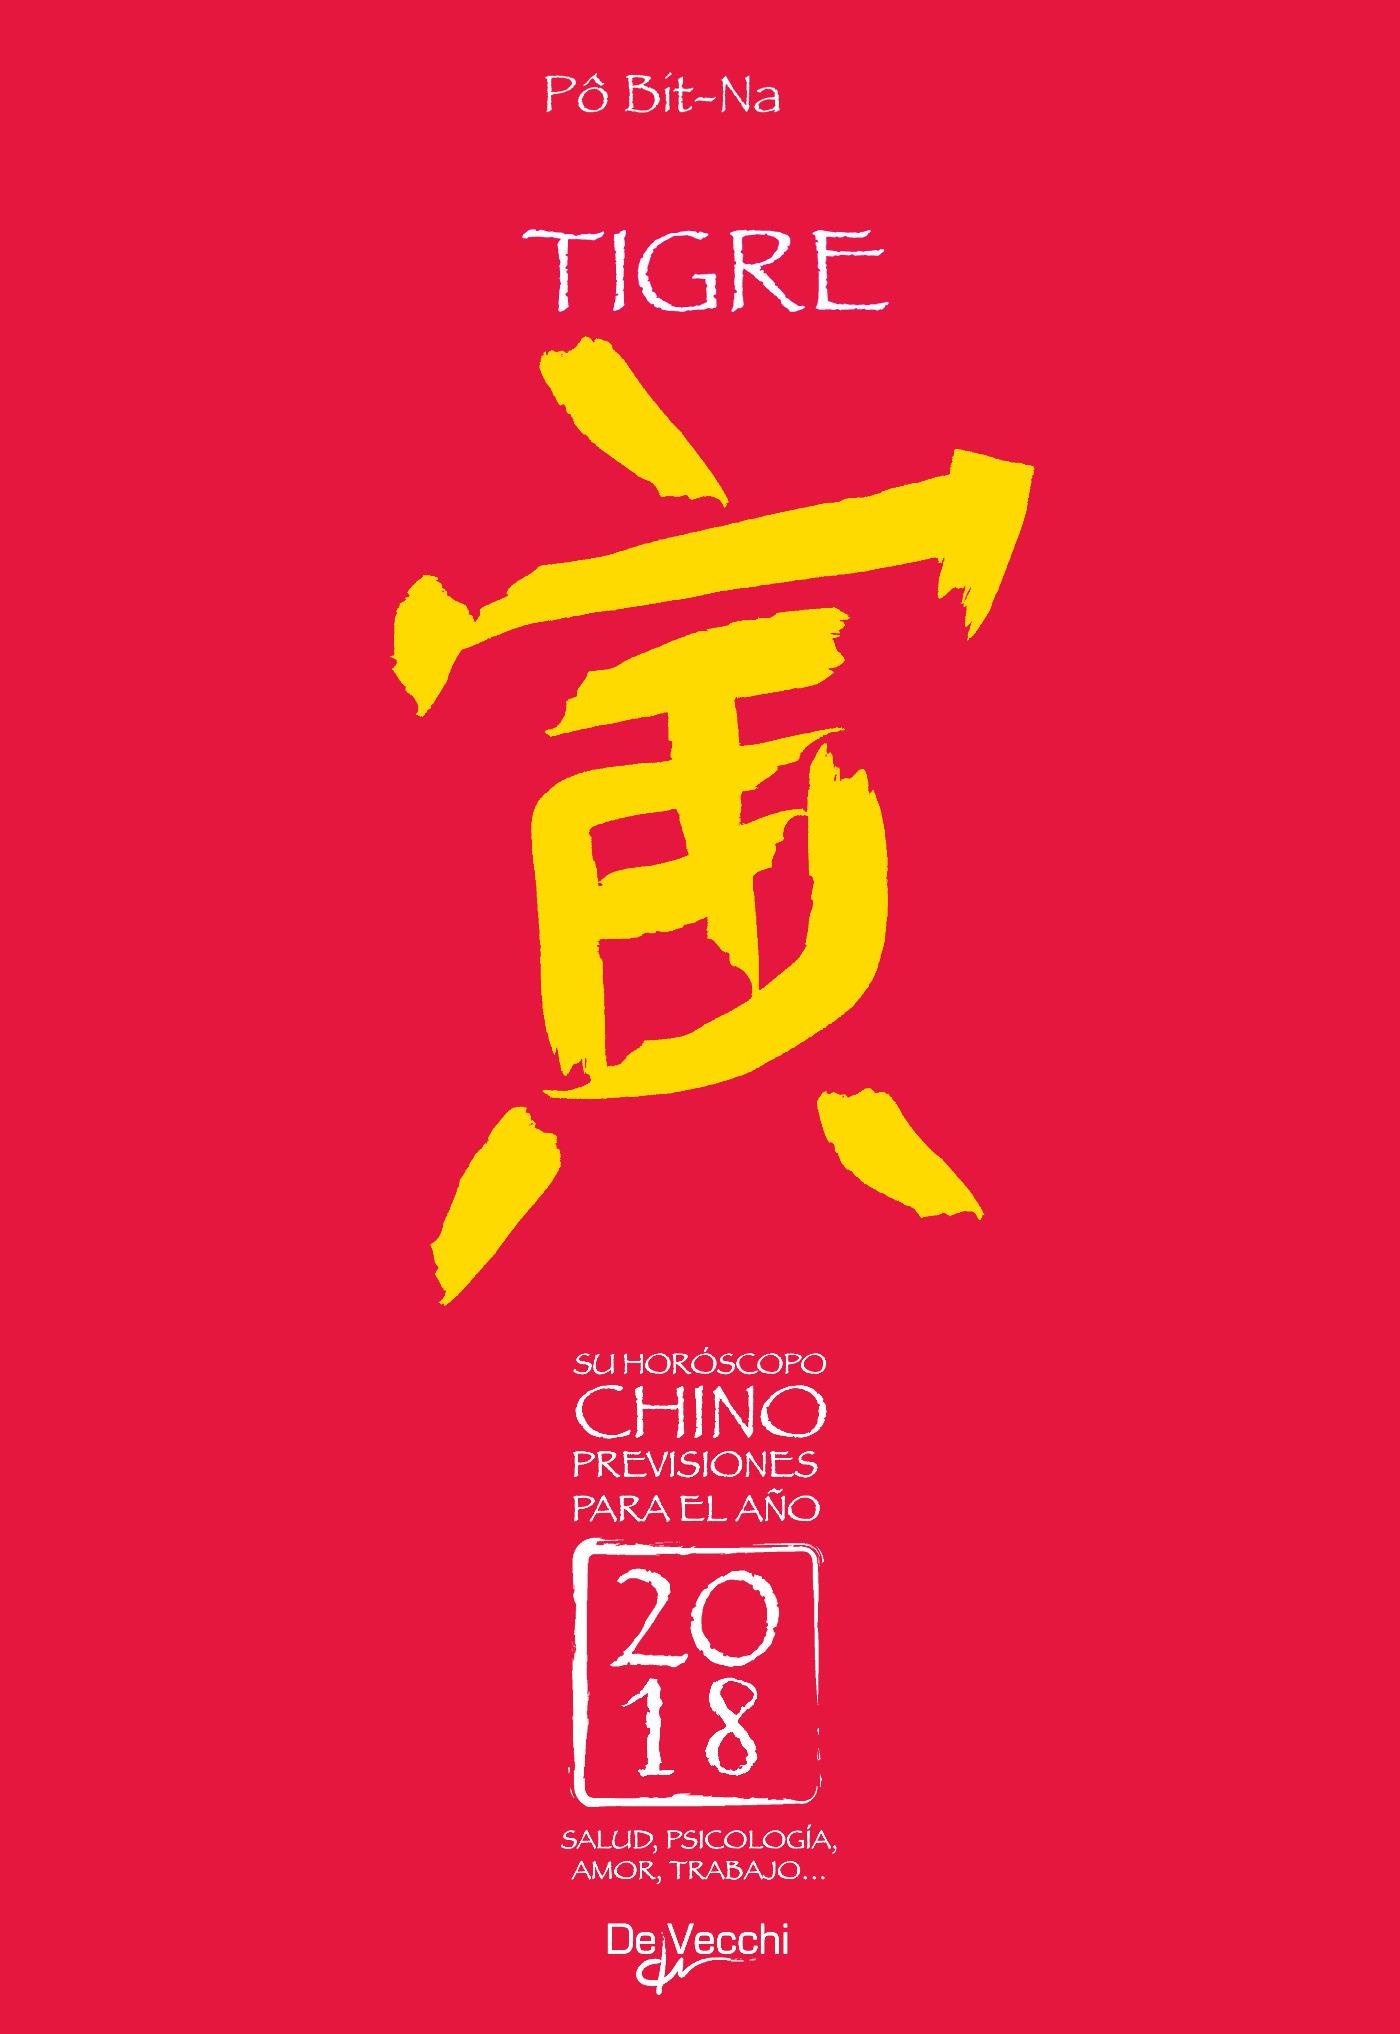 Bit-Na, Pô - Su horóscopo chino. Tigre, ebook